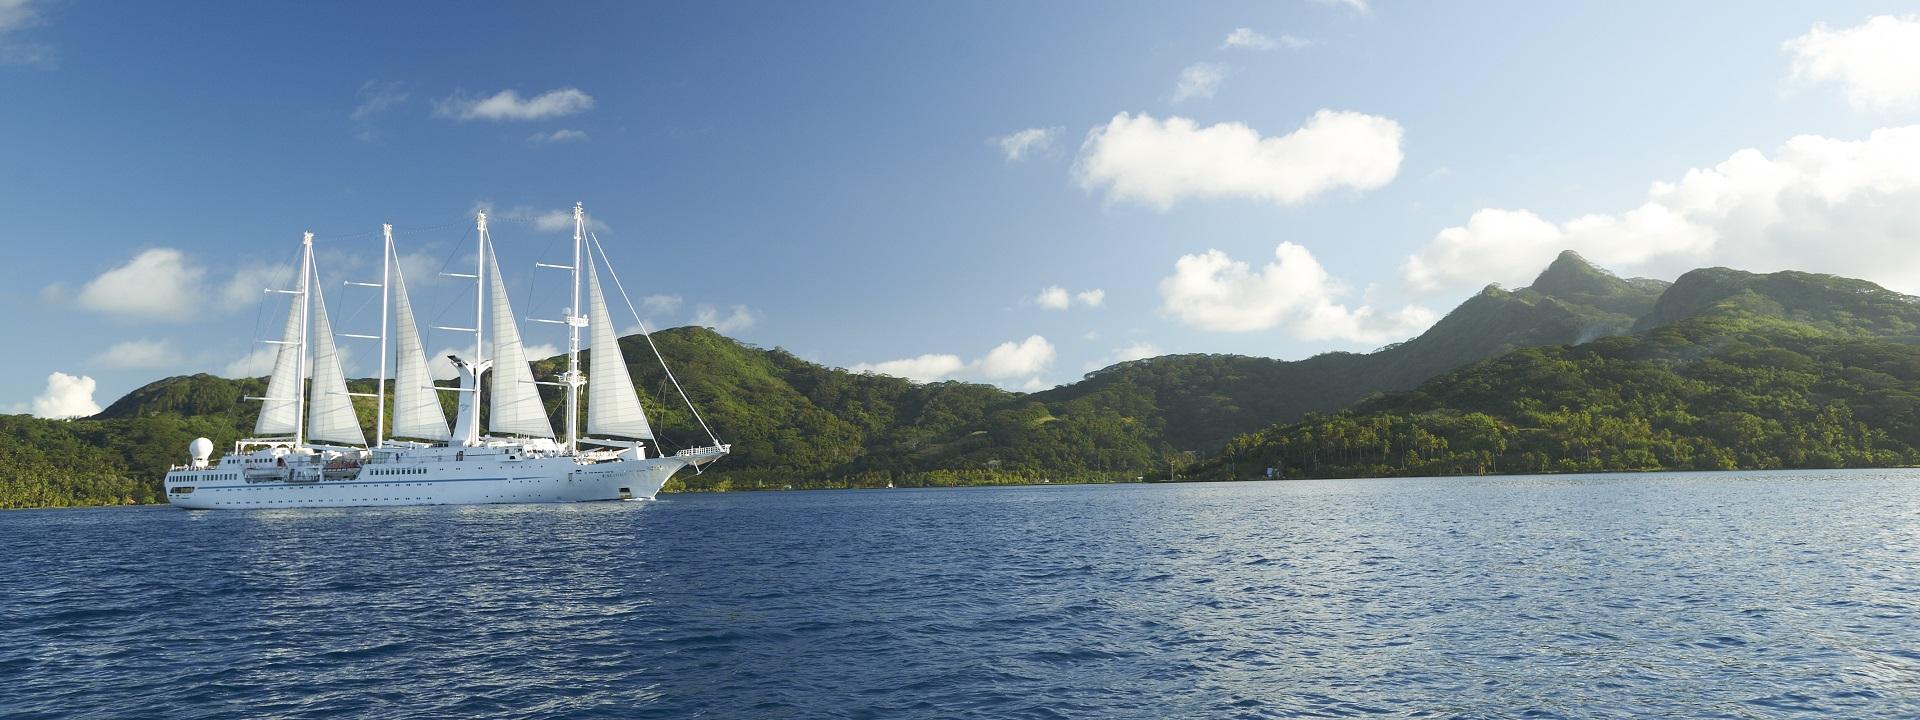 Windstar Cruises Tahiti Cruise In Luxury Yacht Style